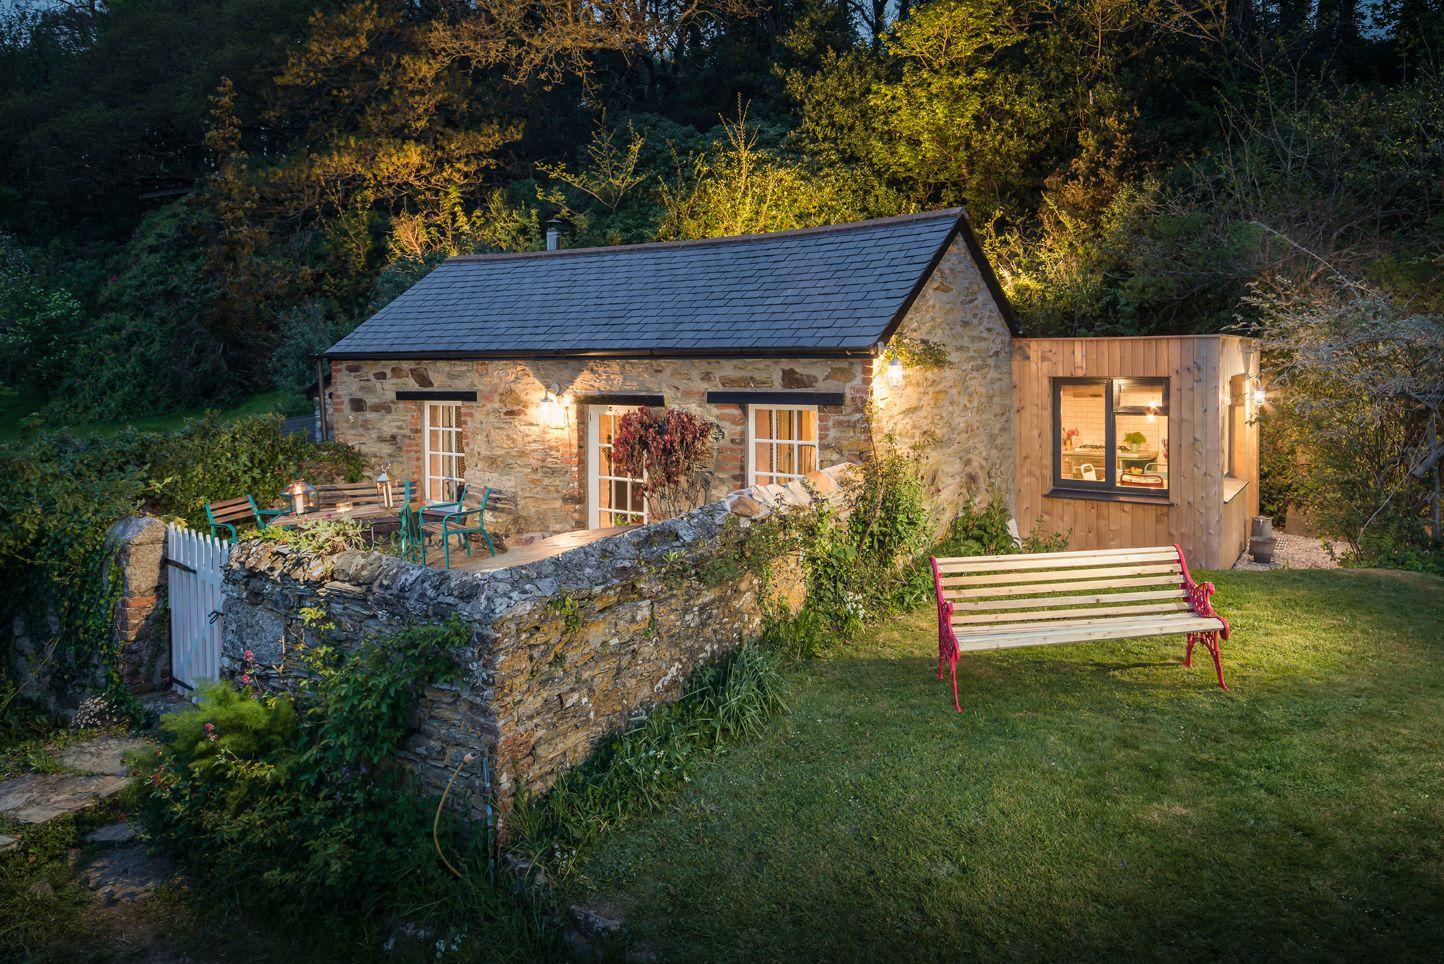 countryside home lien brilleslijper - HD1444×964